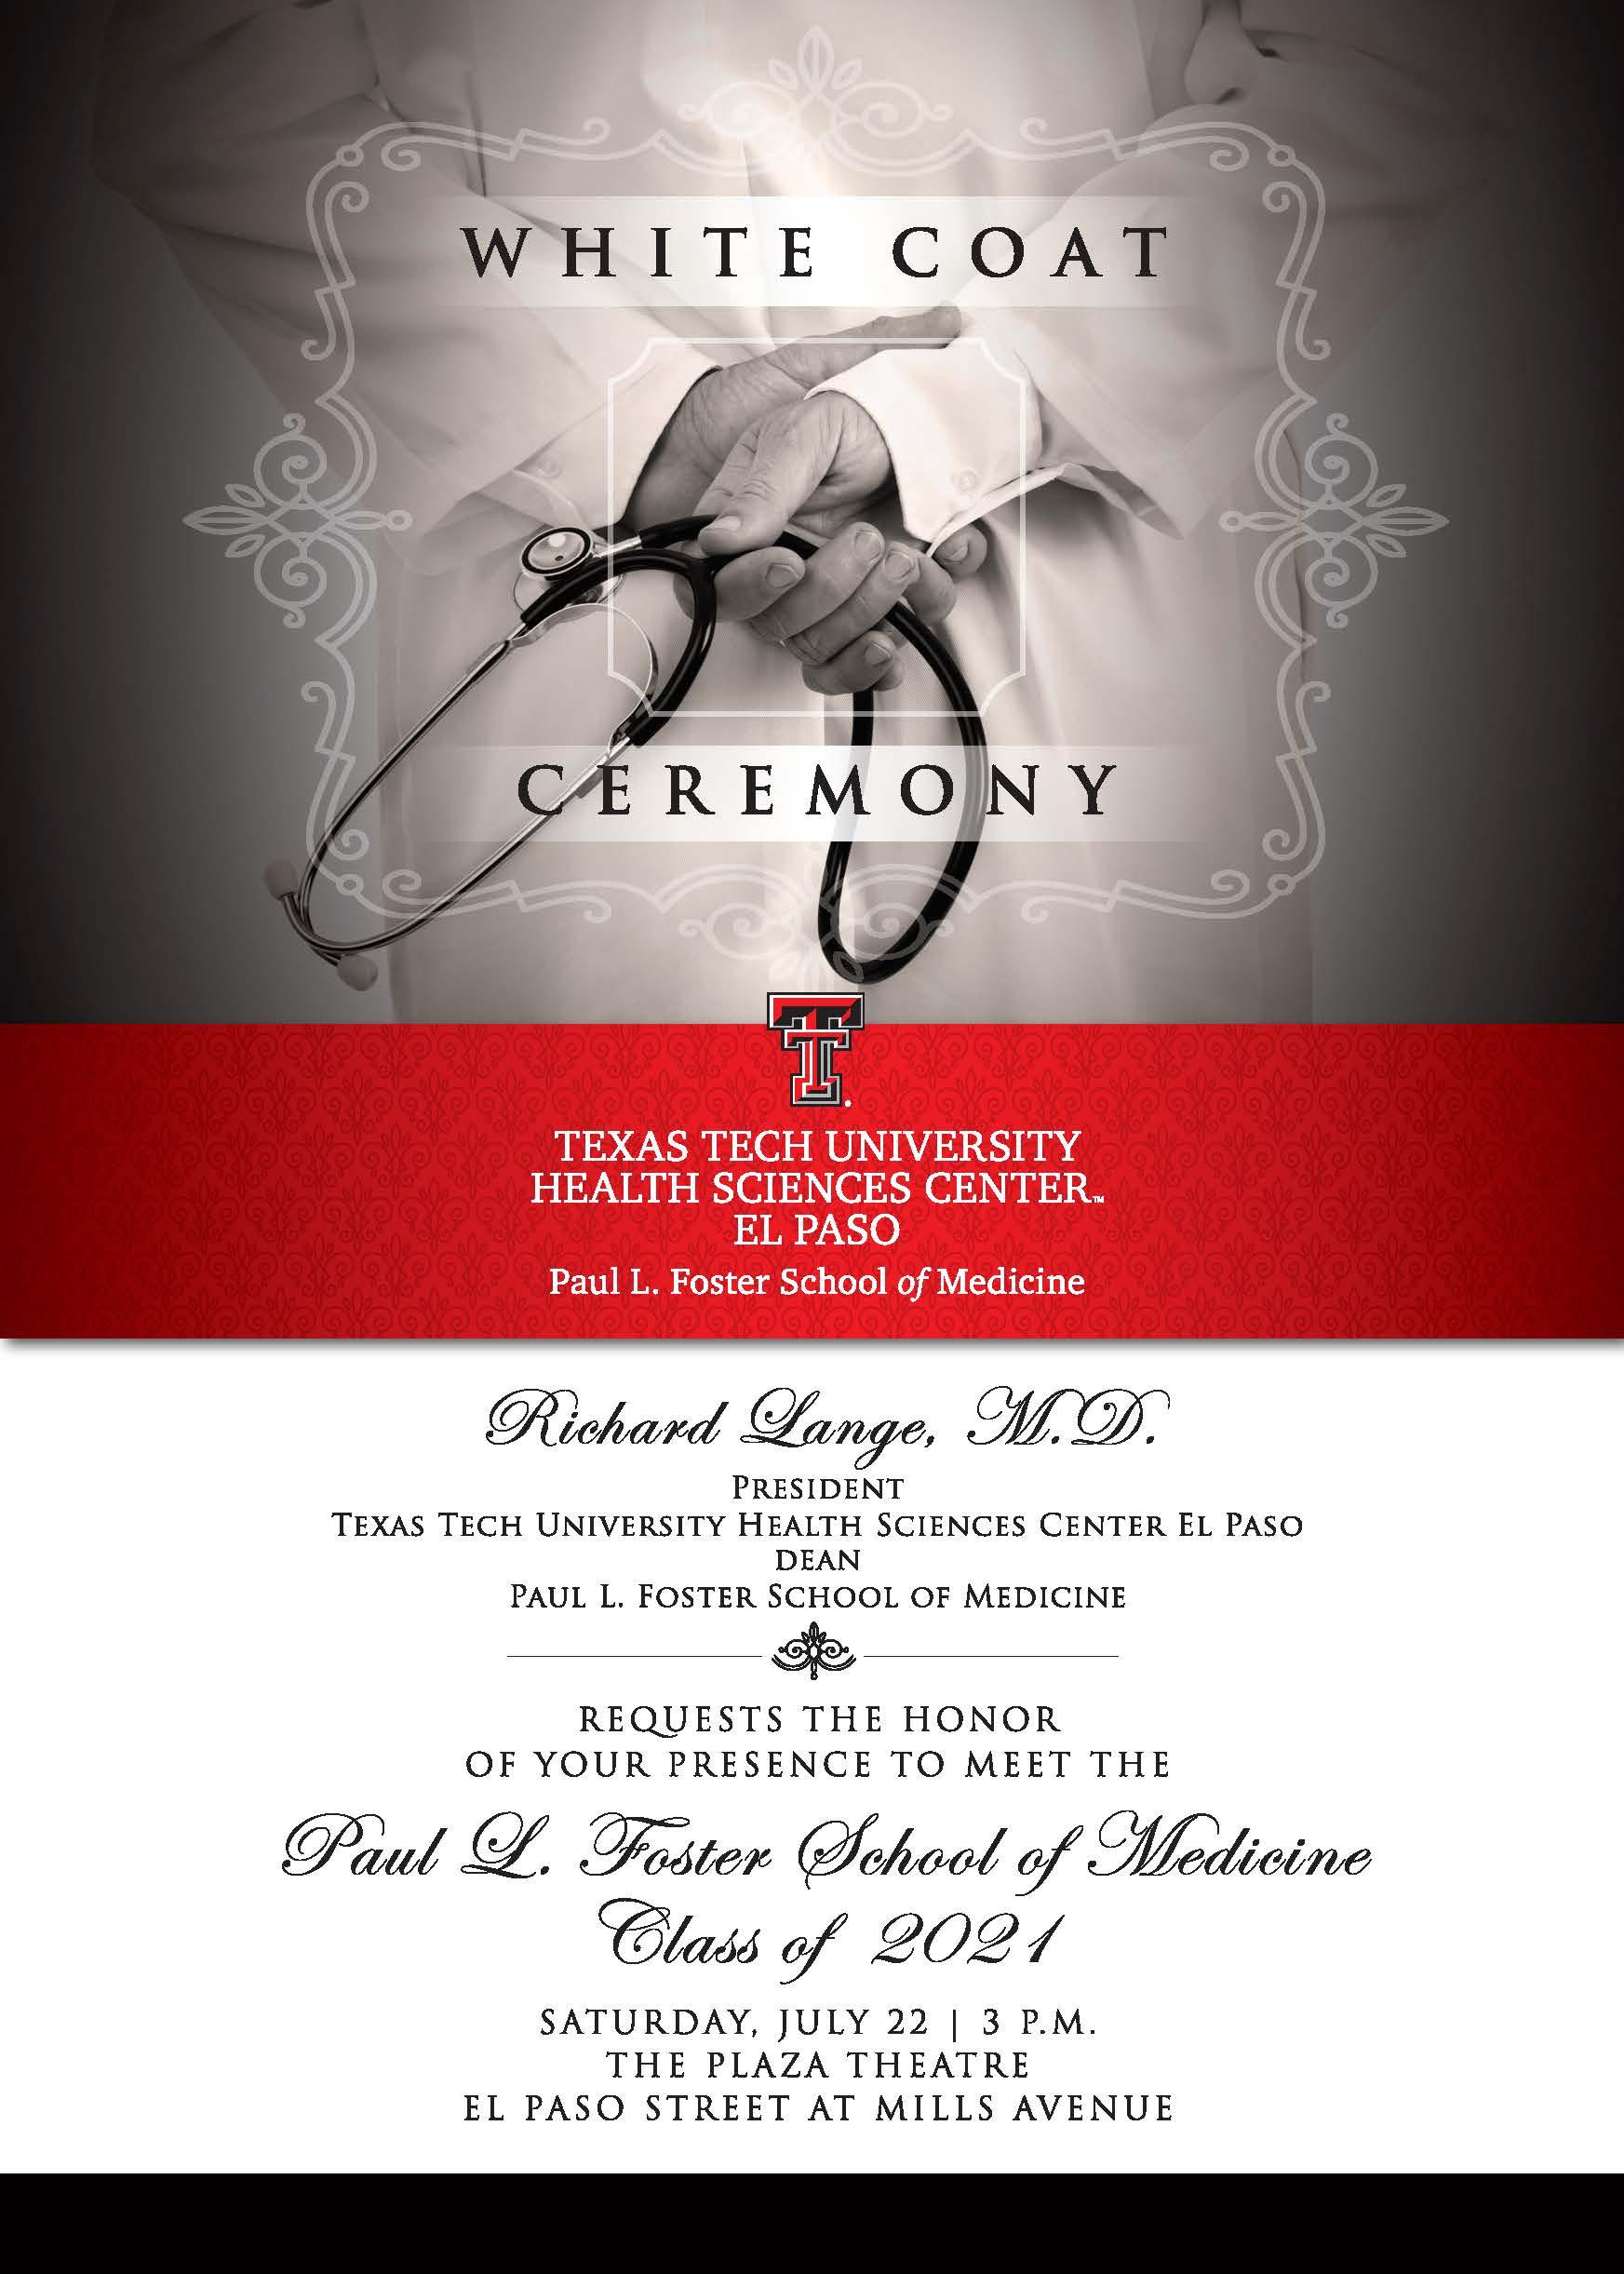 White Coat Ceremony - July 22 intended for Texas Tech Calendar For 2021 -2020